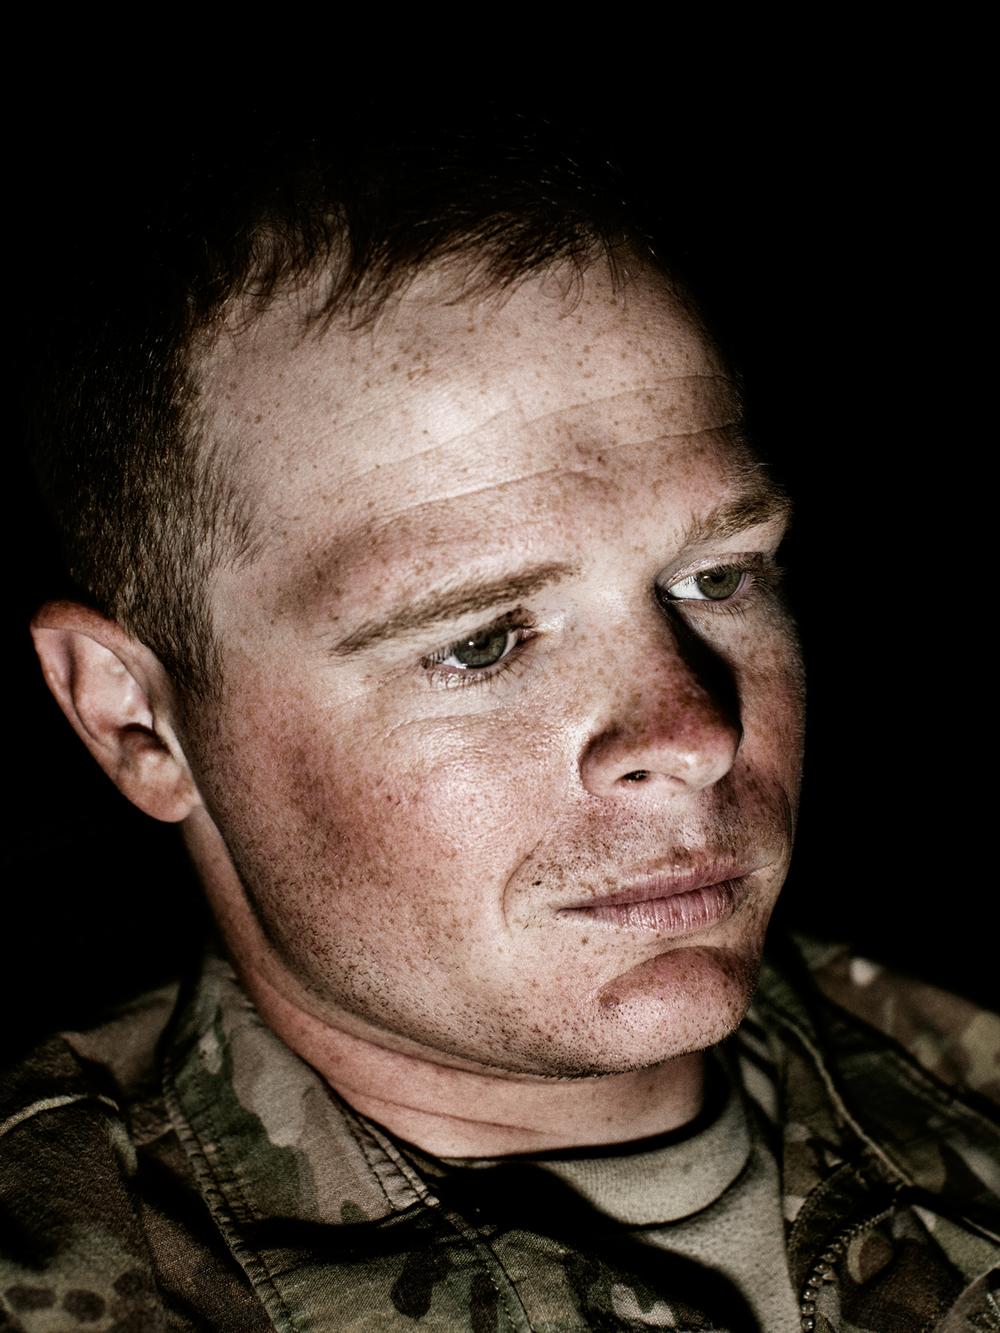 U.S. Army Specialist Nathaniel Taylor.